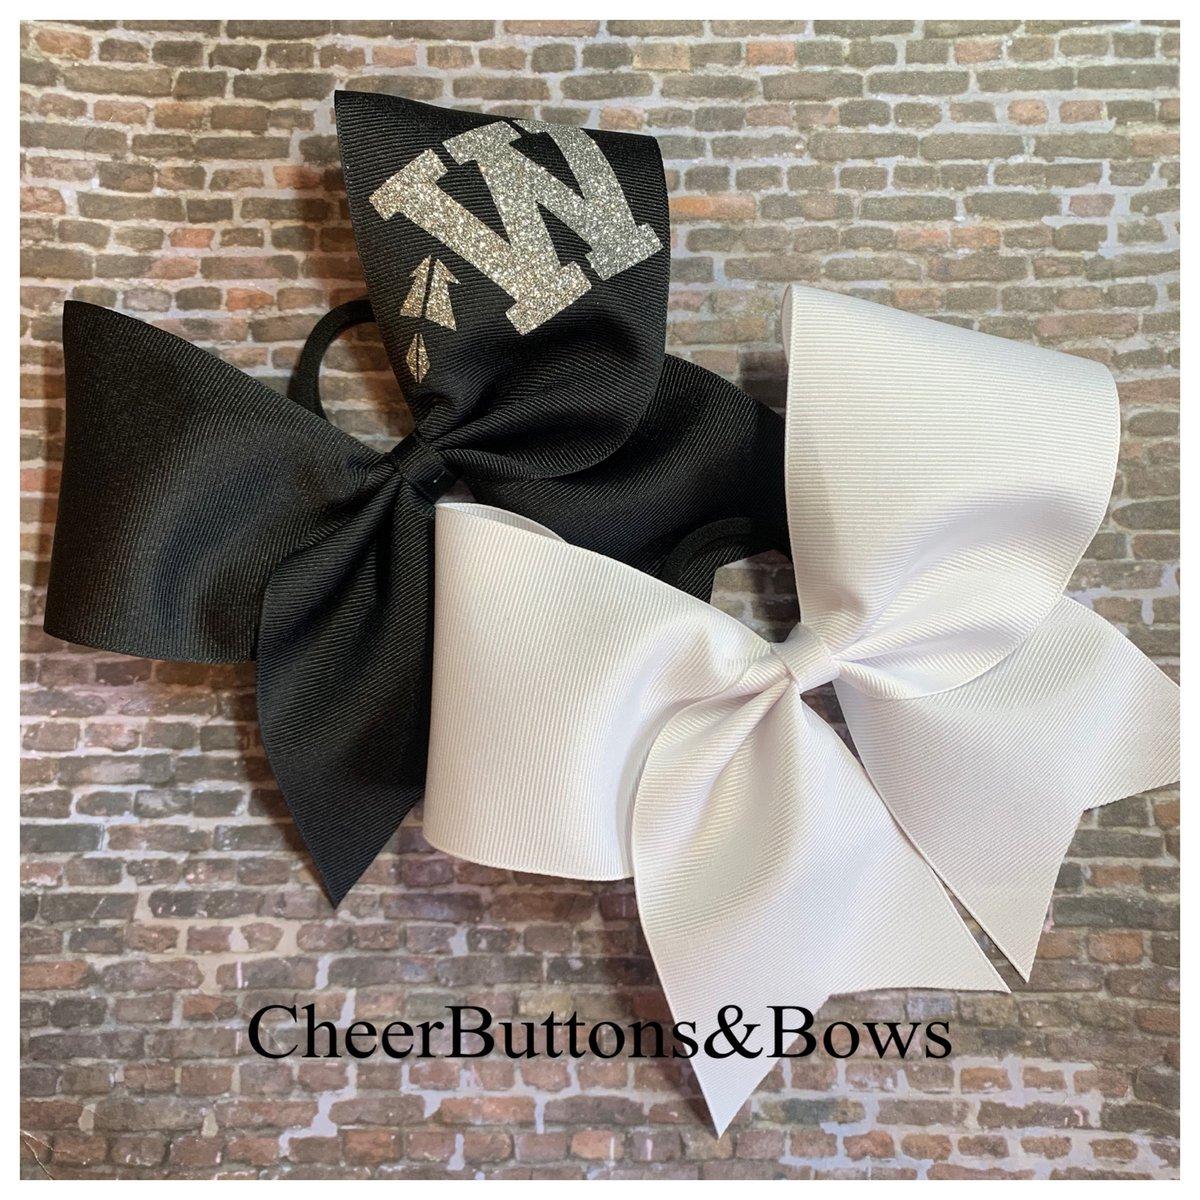 Waterloo West High School, Iowa camp bows https://soo.nr/d0sR #cheerbow #cheerleading #cheerleader #cheerislife #cheer #cheerleader #cheercoach #cheerleaders #cheerbows #hairbows #cheerbuttonsandbowspic.twitter.com/F7HEiyRaHF